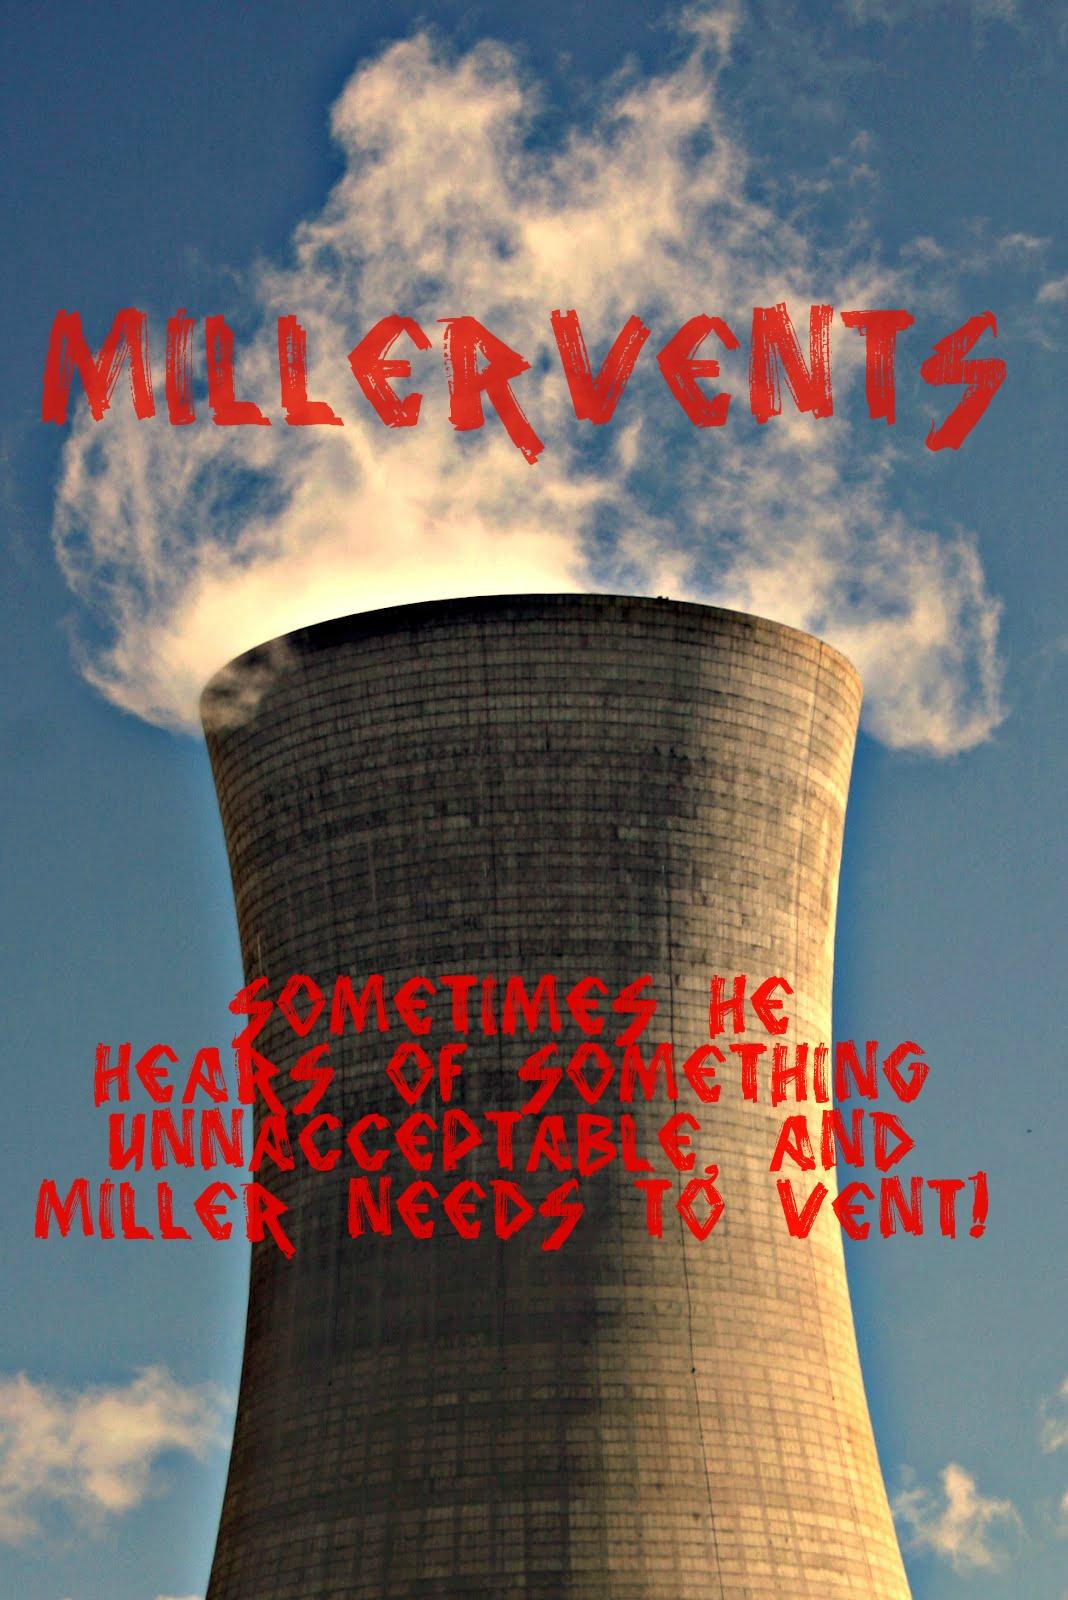 MILLERVENTS